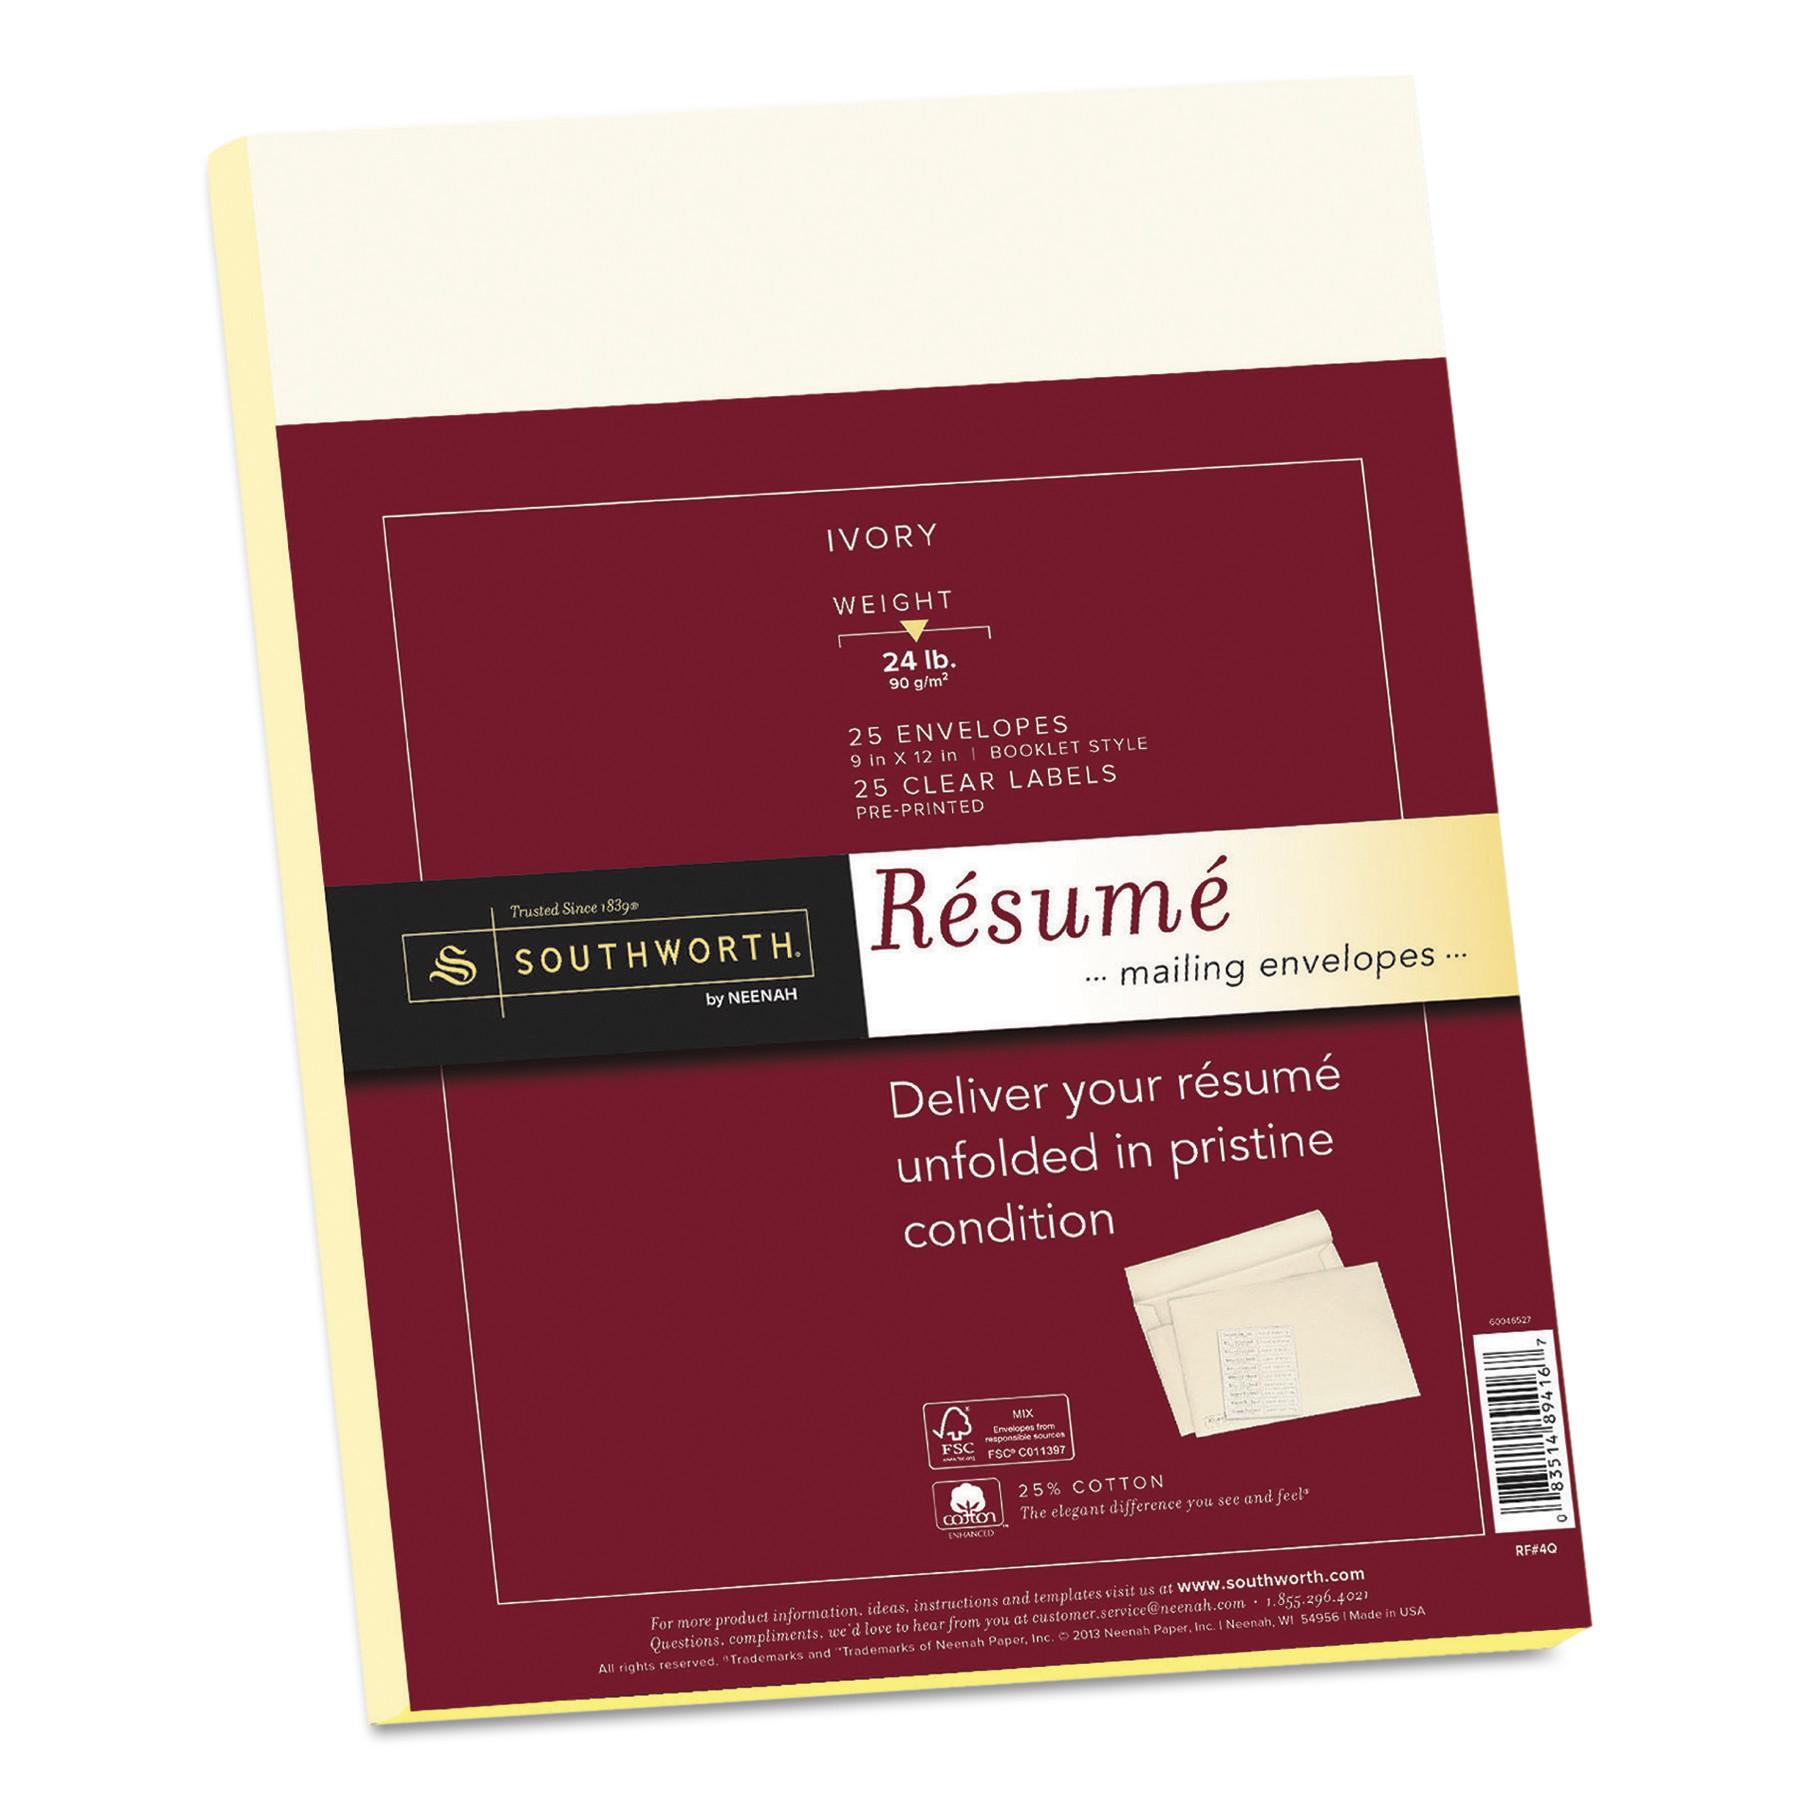 Southworth 25% Cotton Resume Envelopes, Ivory, 24lb, 9 x 12, Wove, 25/Box -SOURF4Q